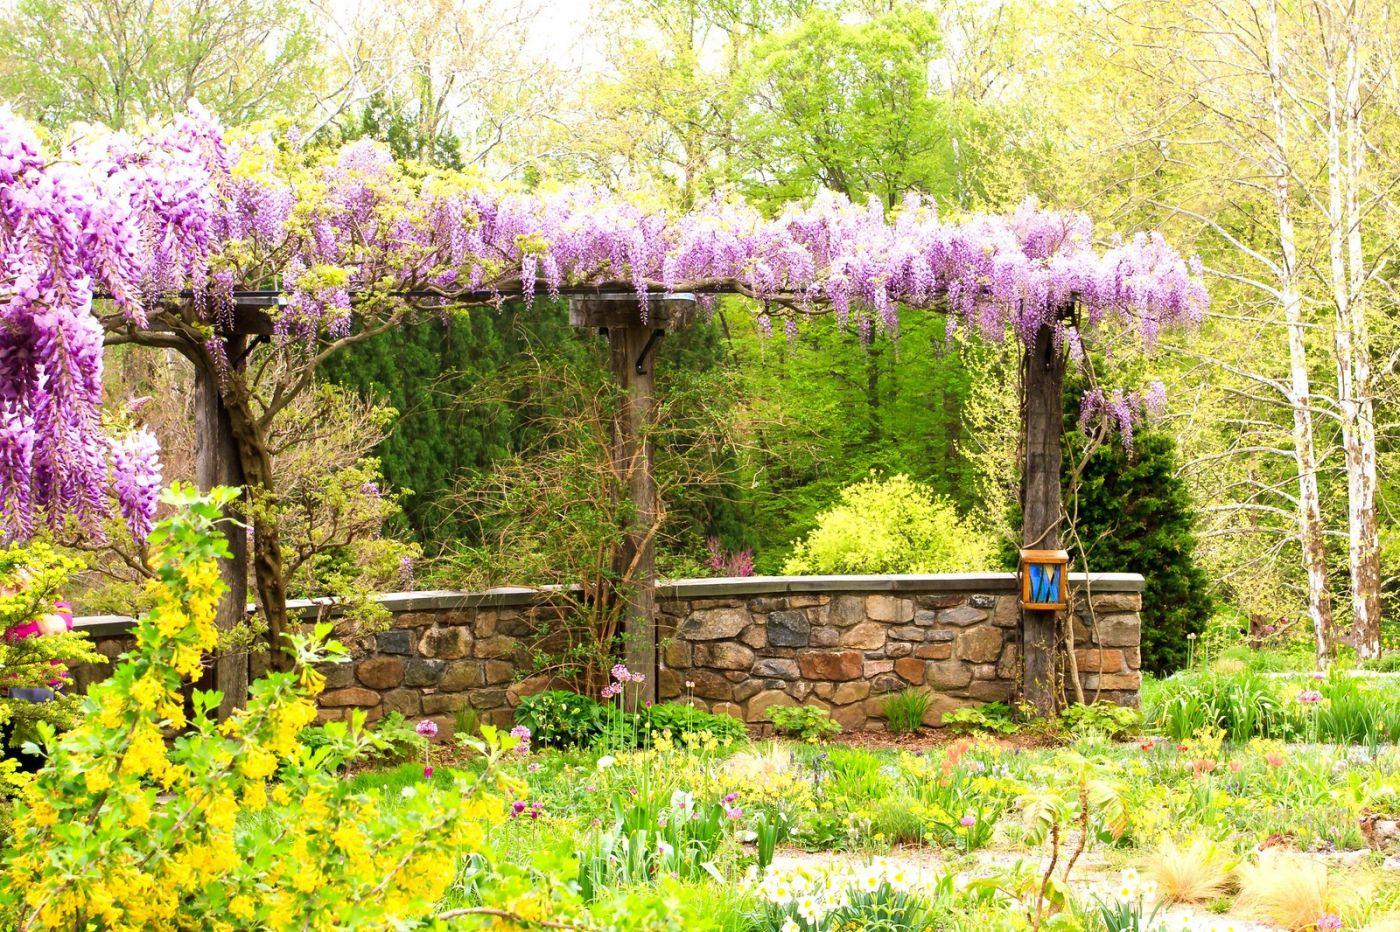 Chanticleer花园,那年盛开的紫藤花_图1-6